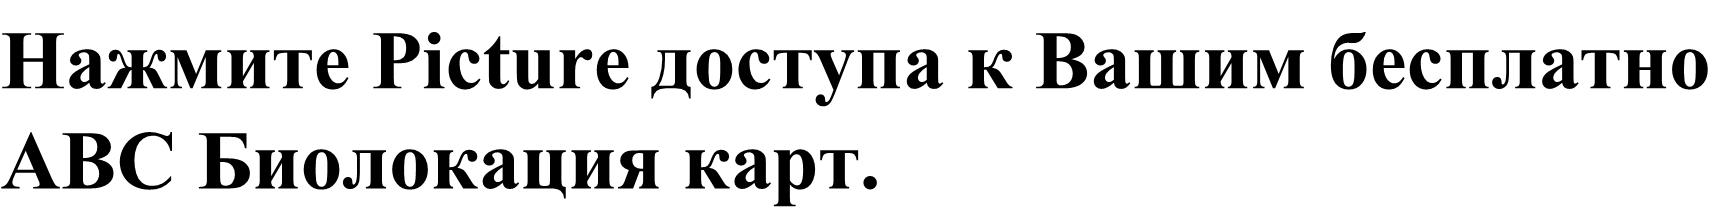 Russain